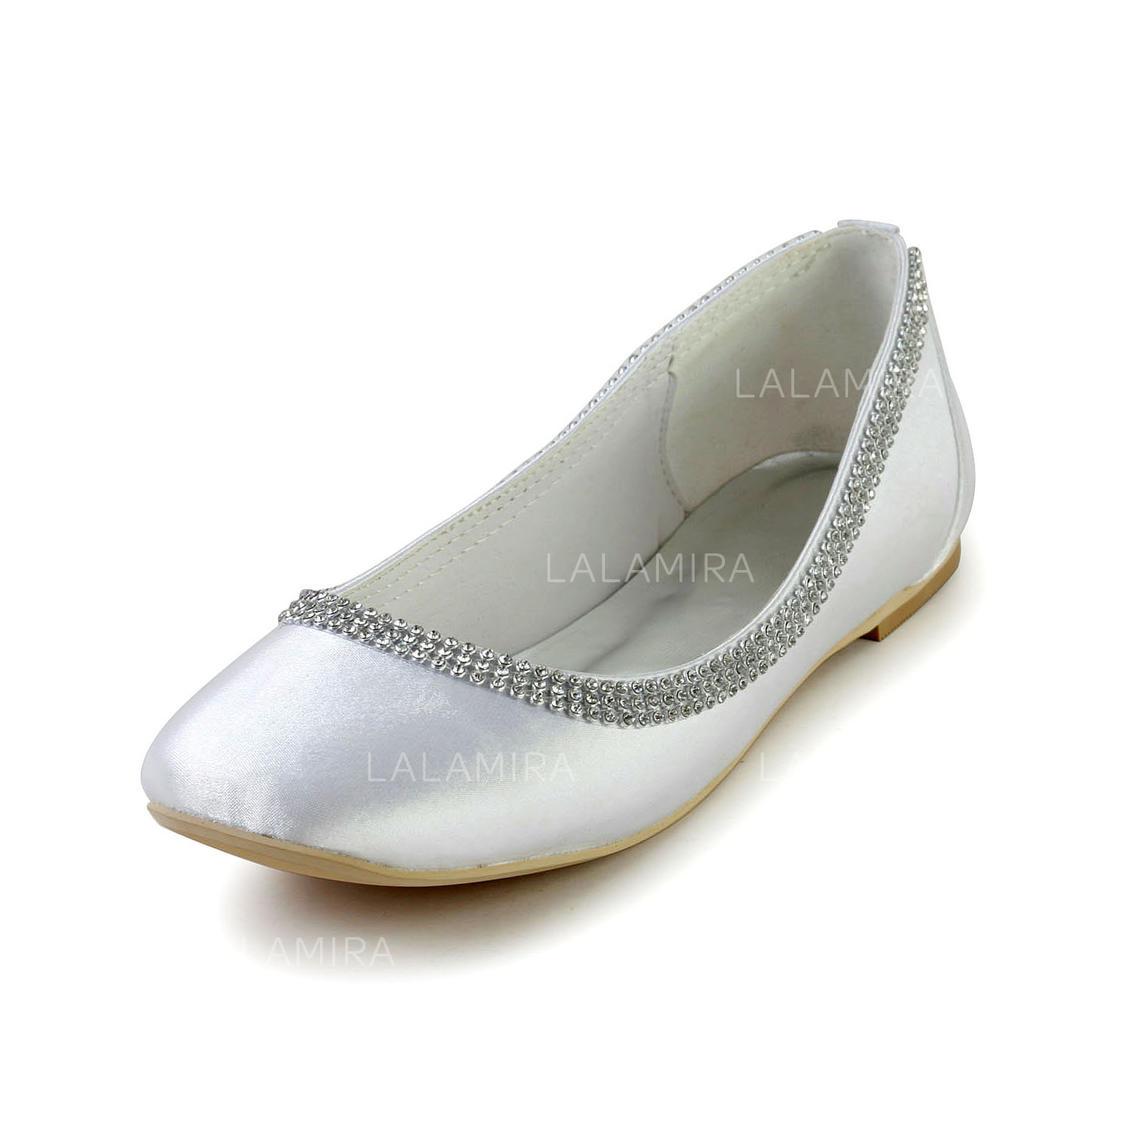 319c6a0490c Women s Closed Toe Flats Flat Heel Silk Like Satin With Rhinestone Wedding  Shoes (047203303). Loading zoom